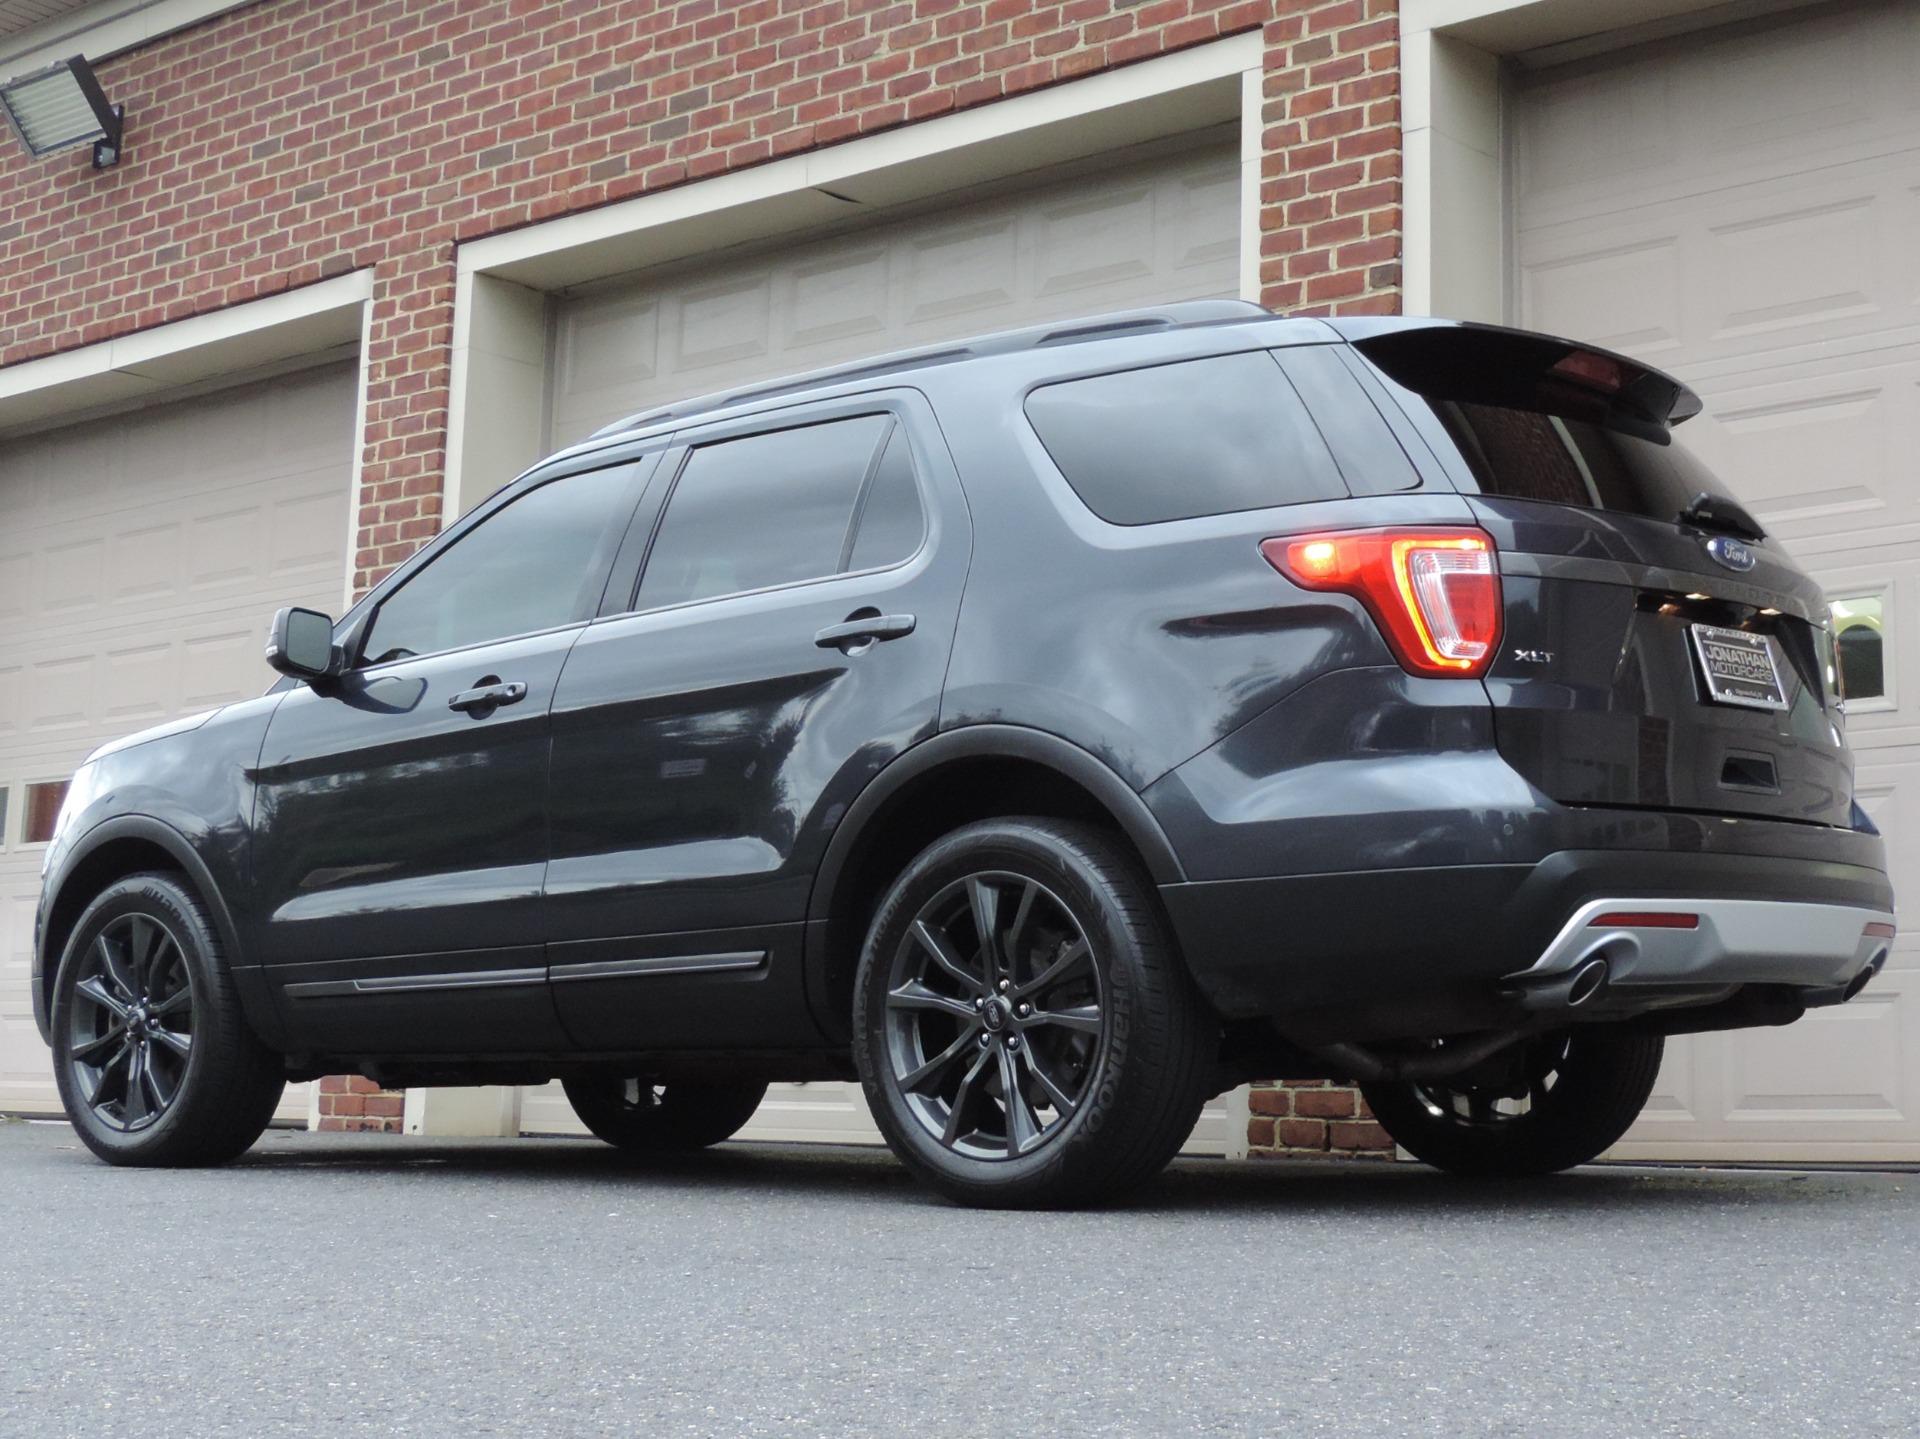 Used-2017-Ford-Explorer-XLT-Sport-Appearance